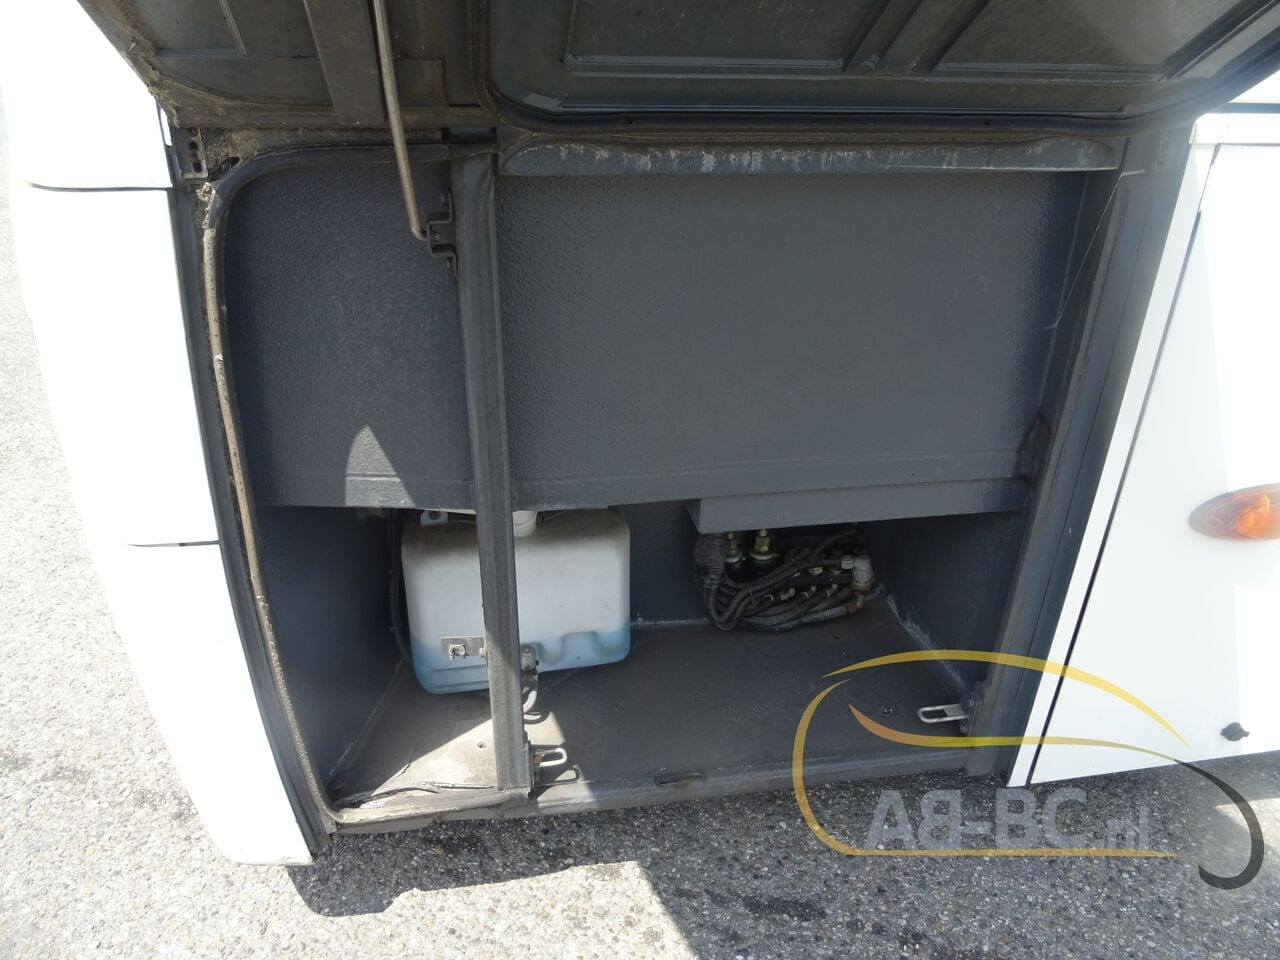 coach-busTEMSA-Safari-RD-DAF-Motor-53-Seats-Euro-5---1623932639401623697_big_207fe8bf0e350714498b470744c0922f--21061715155620919600